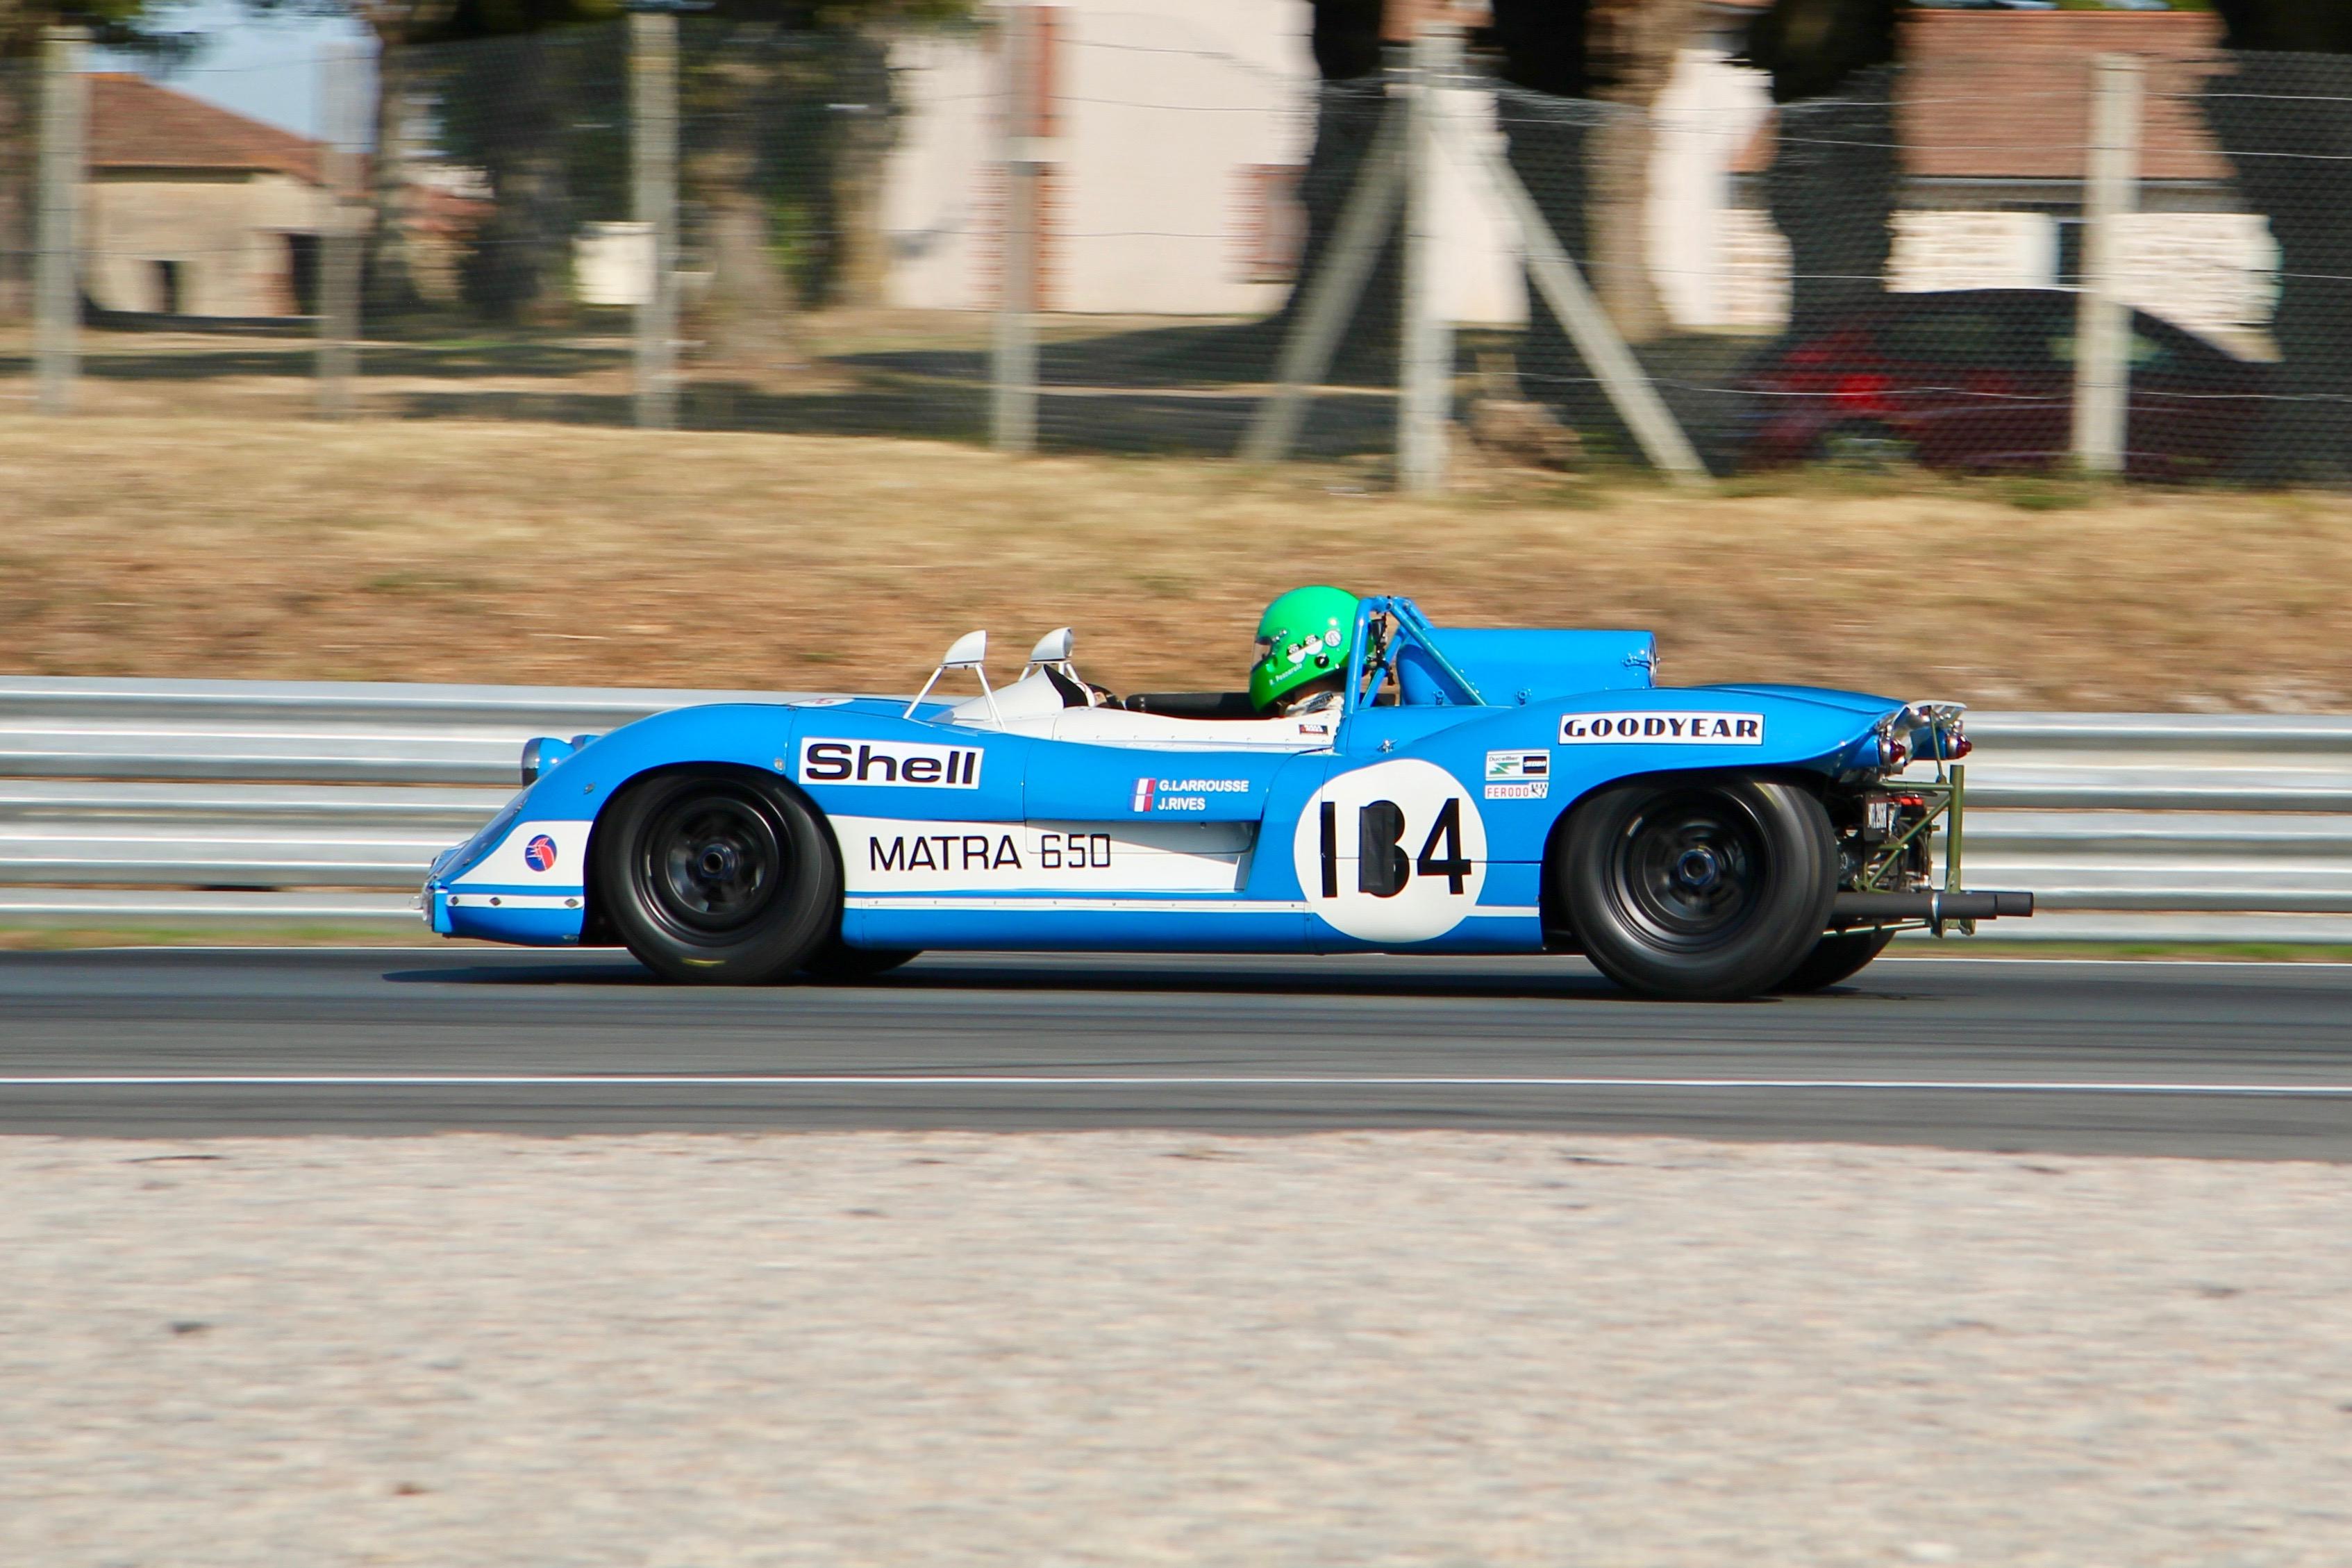 Matra-Simca MS650 - prototype - Gr6 - 1969 - side-face / profil - Henri Pescarolo - Circuit du Vigeant - Sport et Collection - 2020 - photo Ludo Ferrari